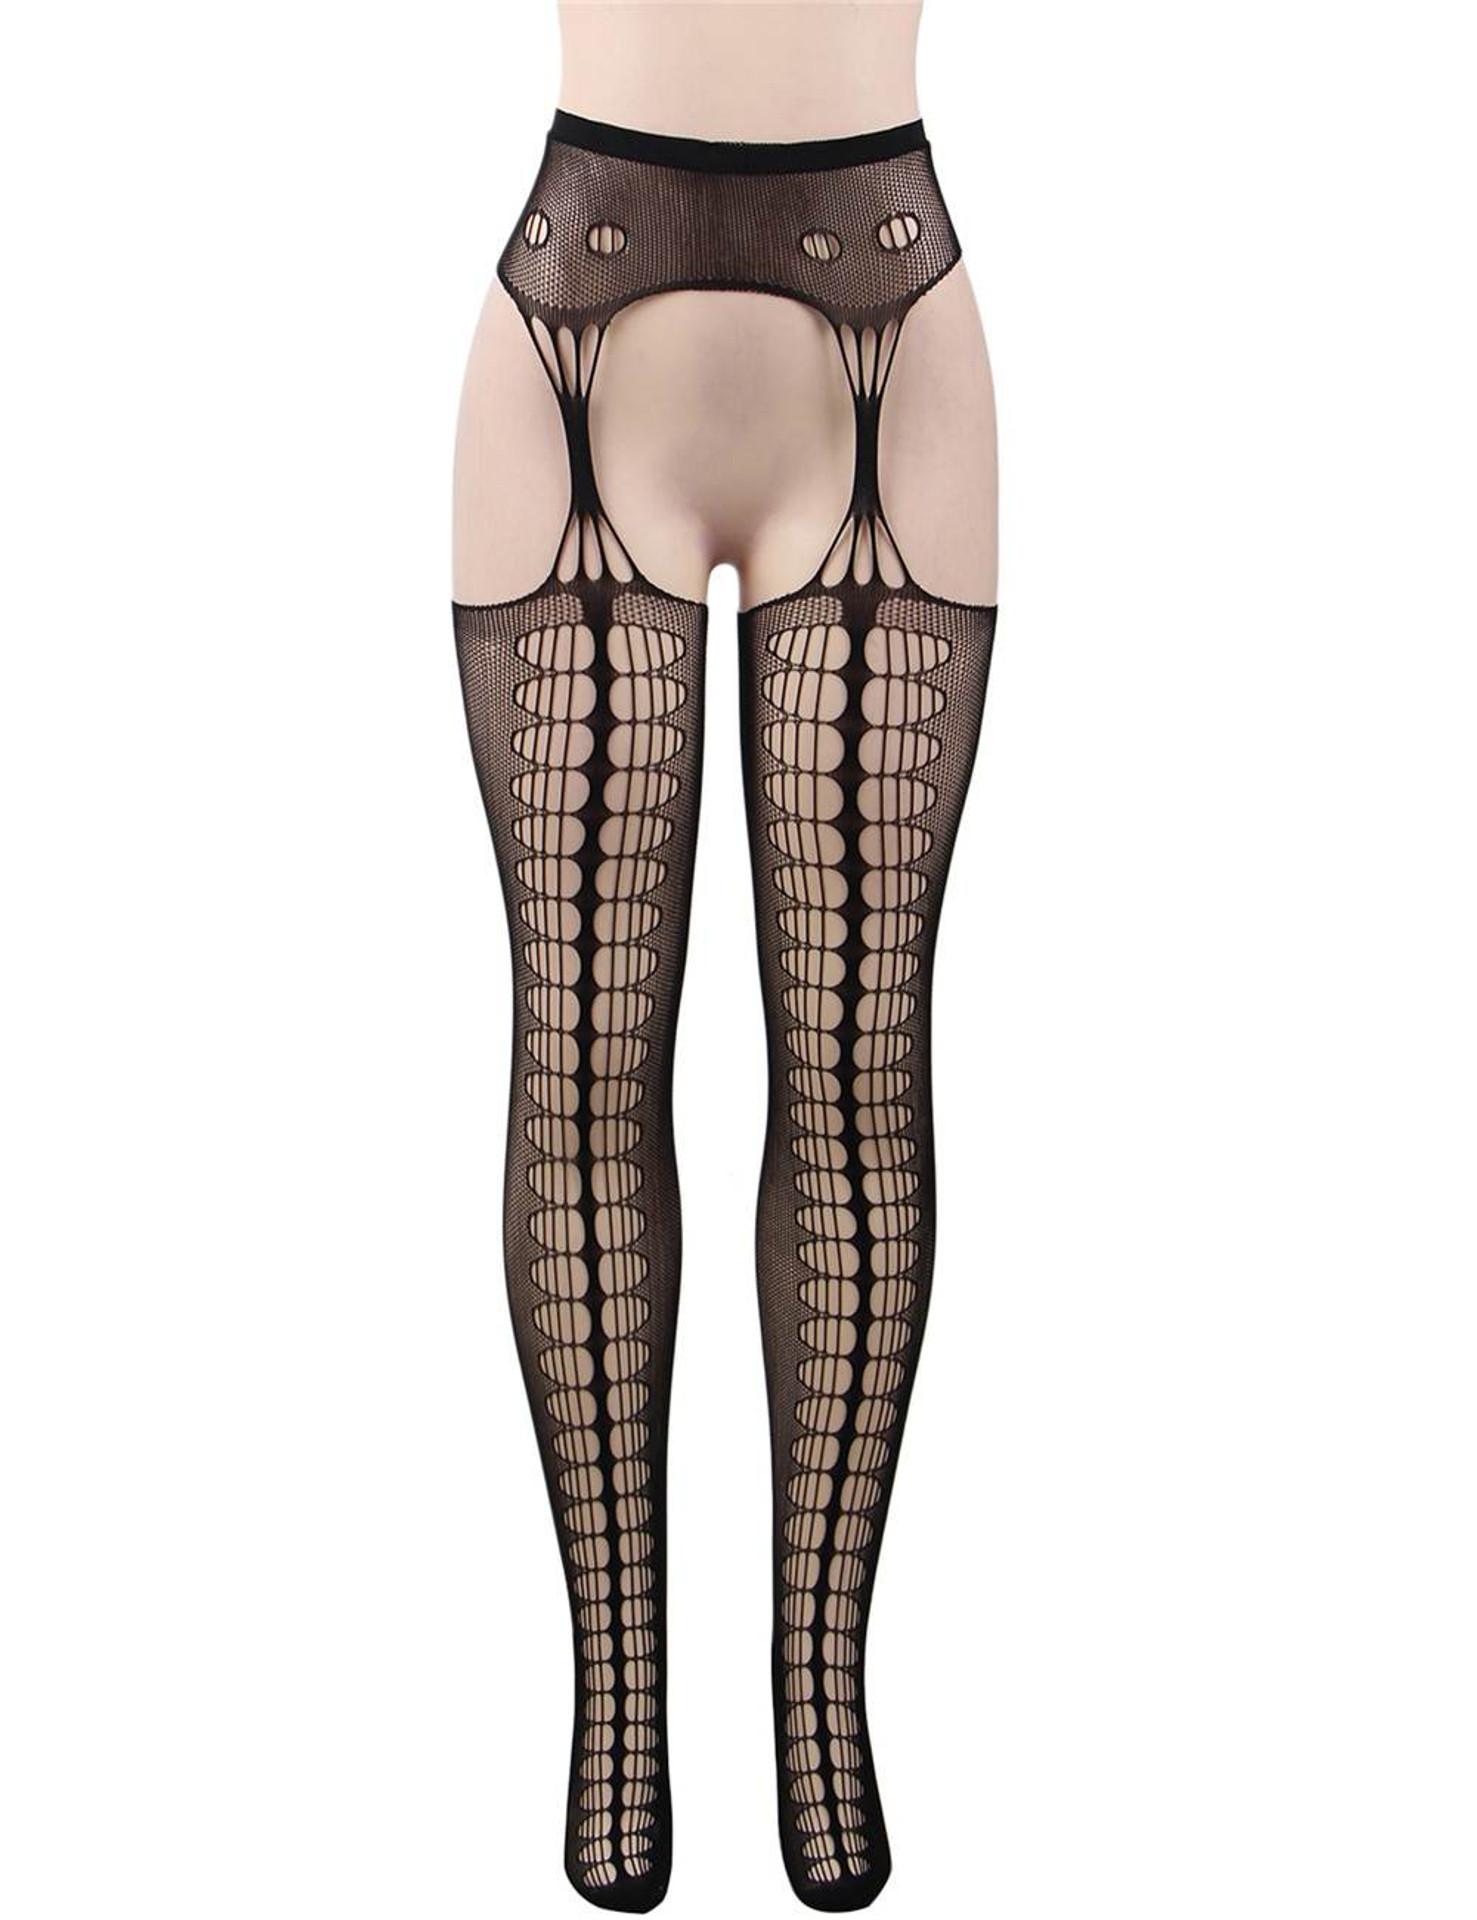 Fishnet Cutout Garter Hose Stockings